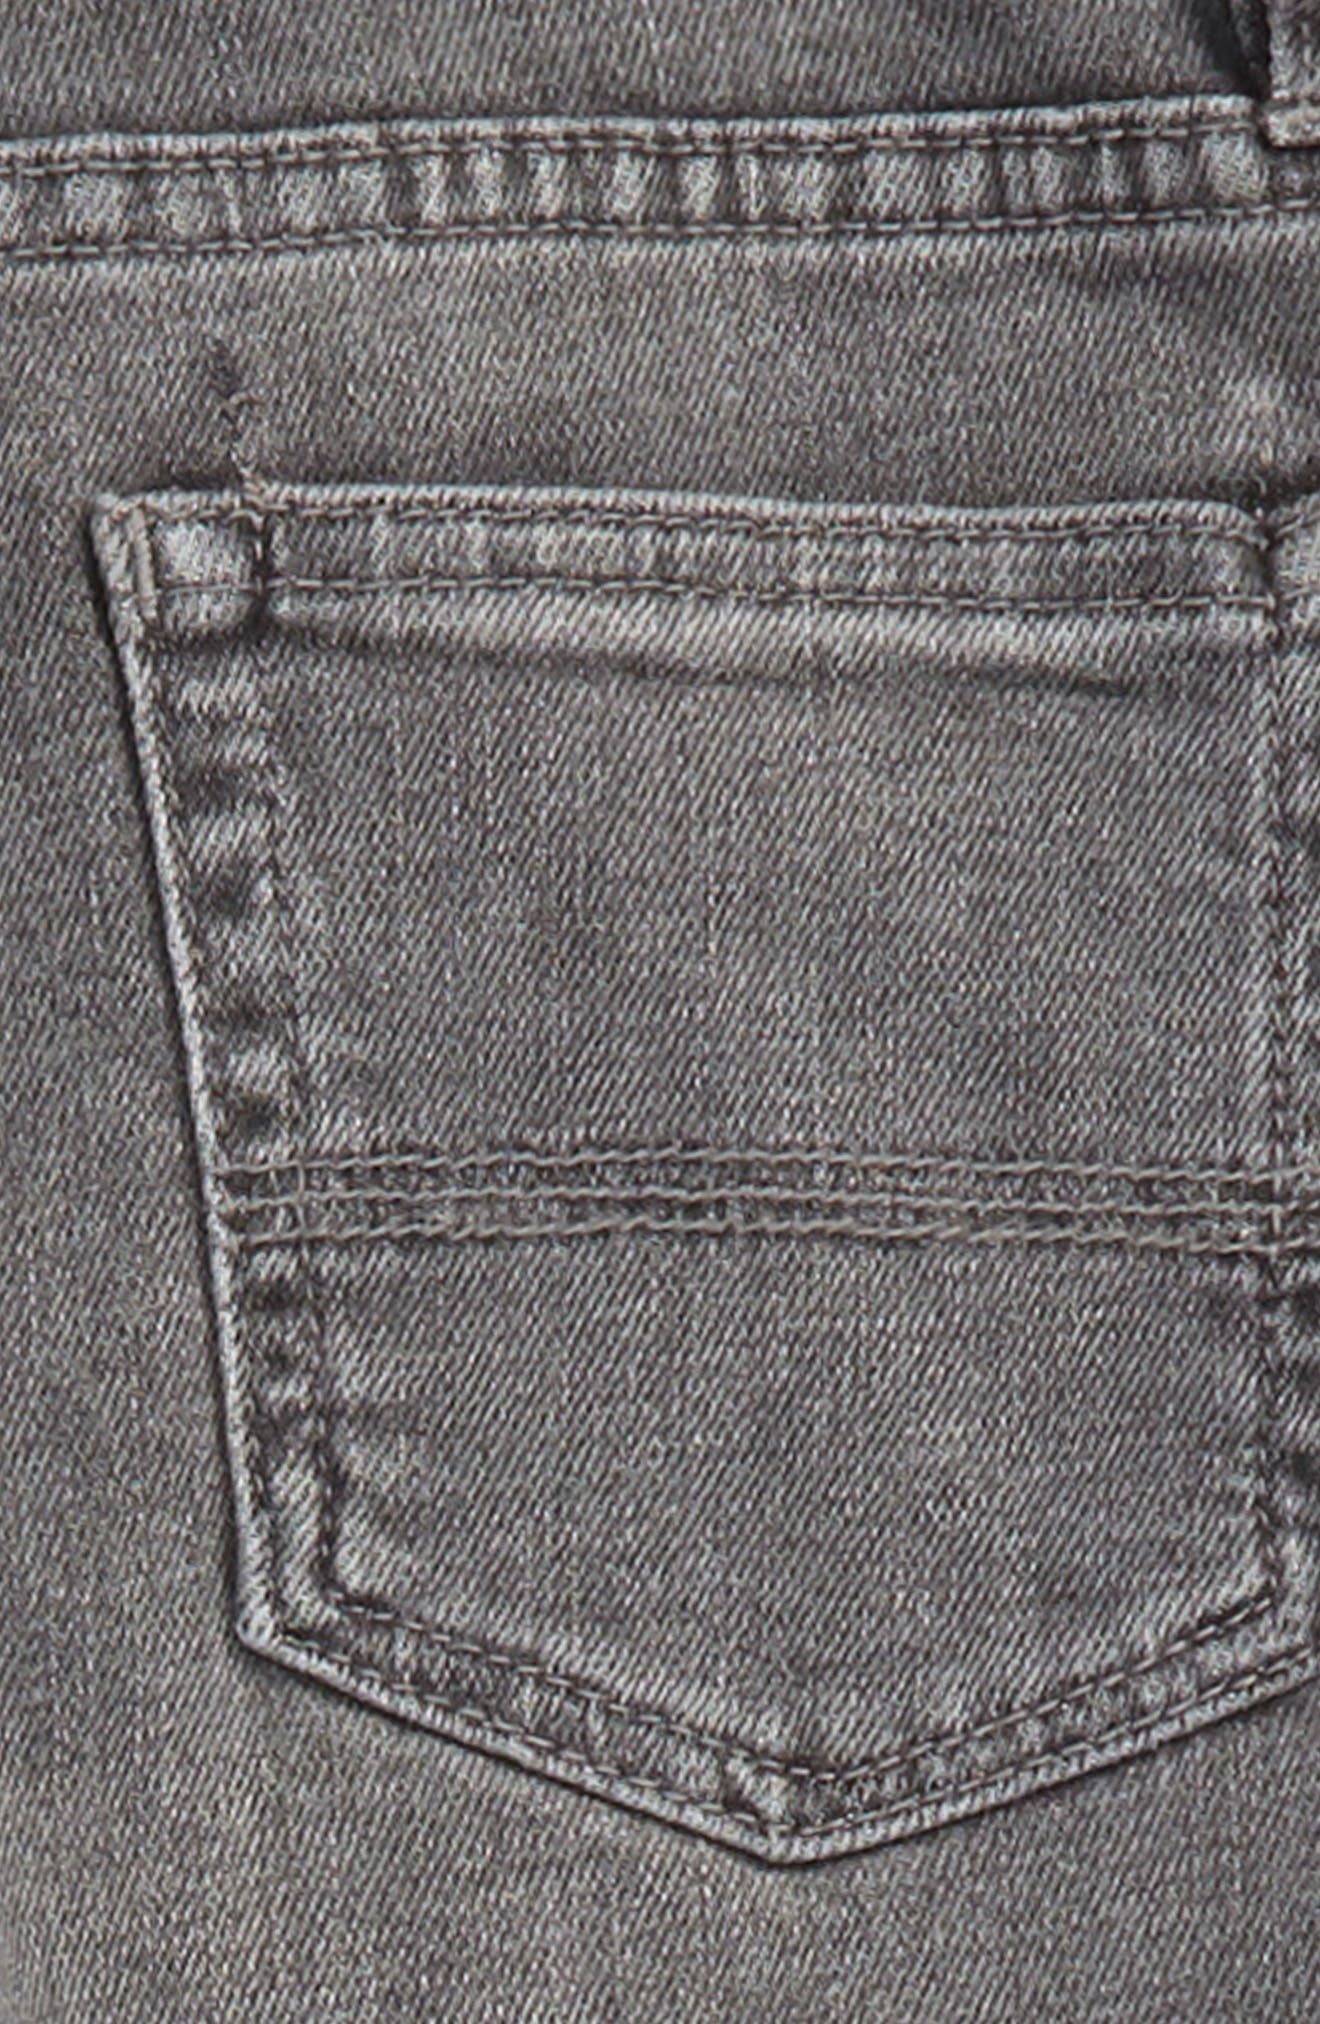 Slouch Jeans,                             Alternate thumbnail 3, color,                             020